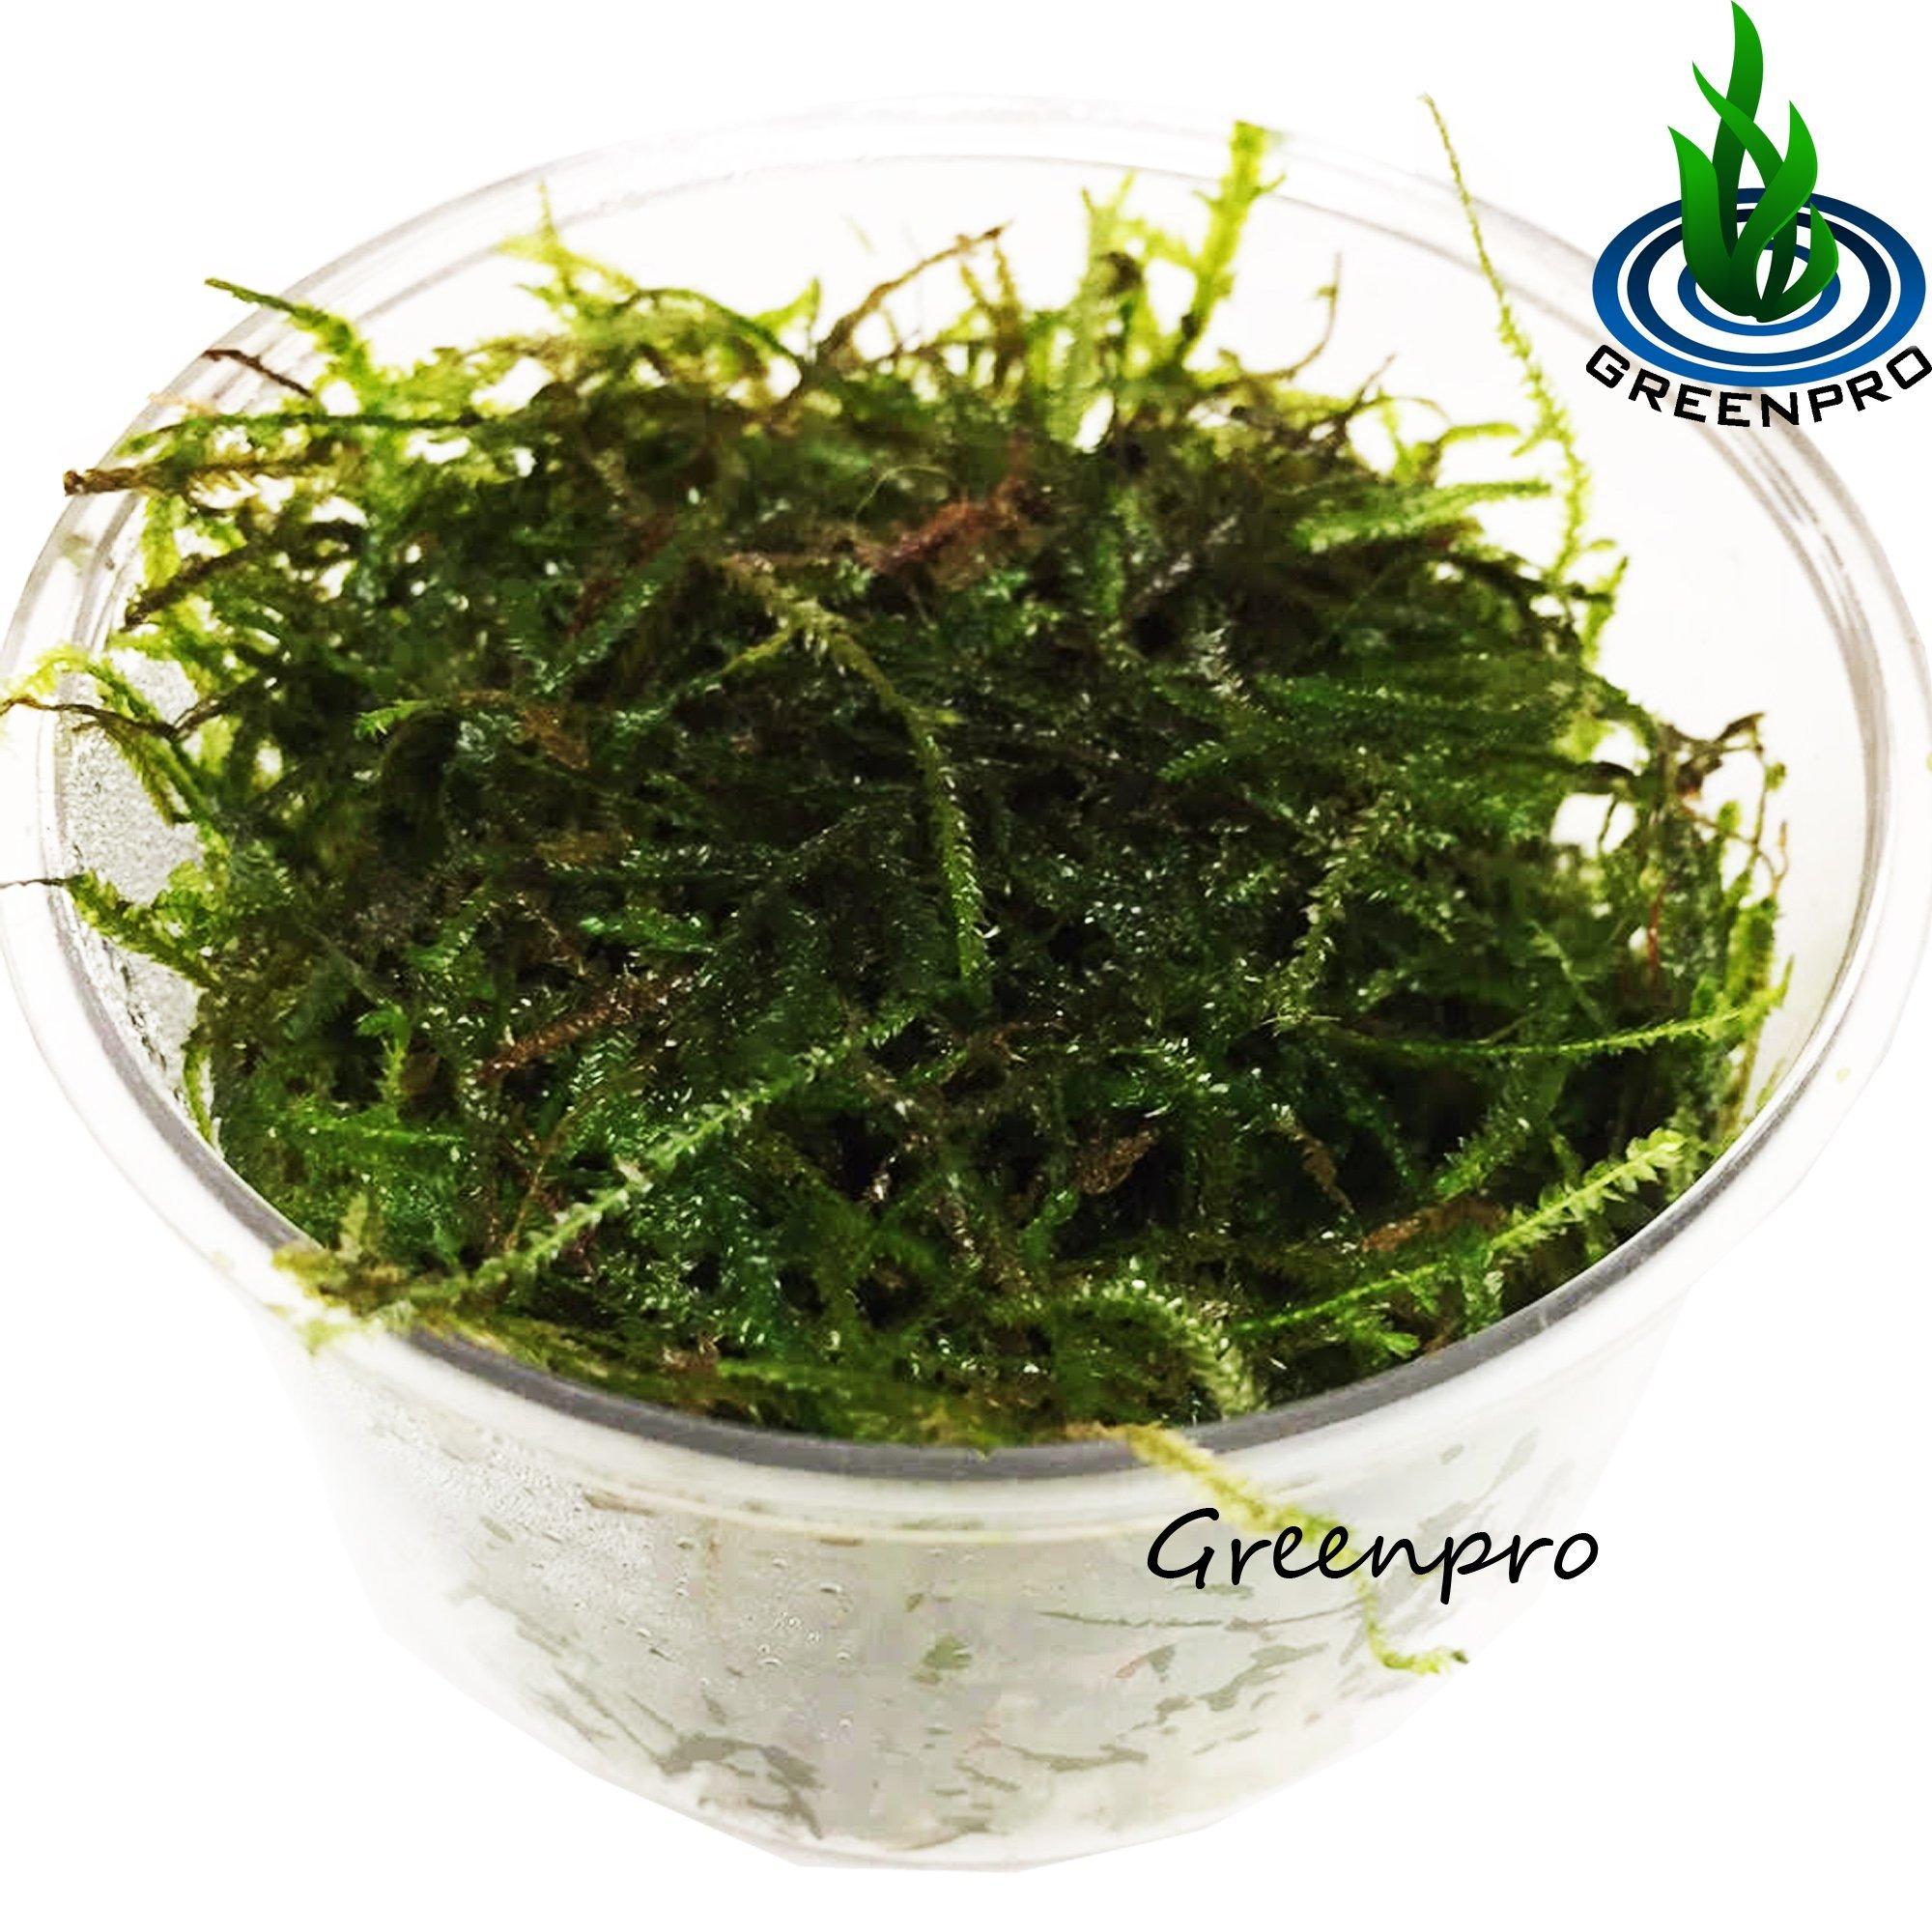 Greenpro Java Moss Live Freshwater Aquarium Plants Easy Ready to Grow by Greenpro